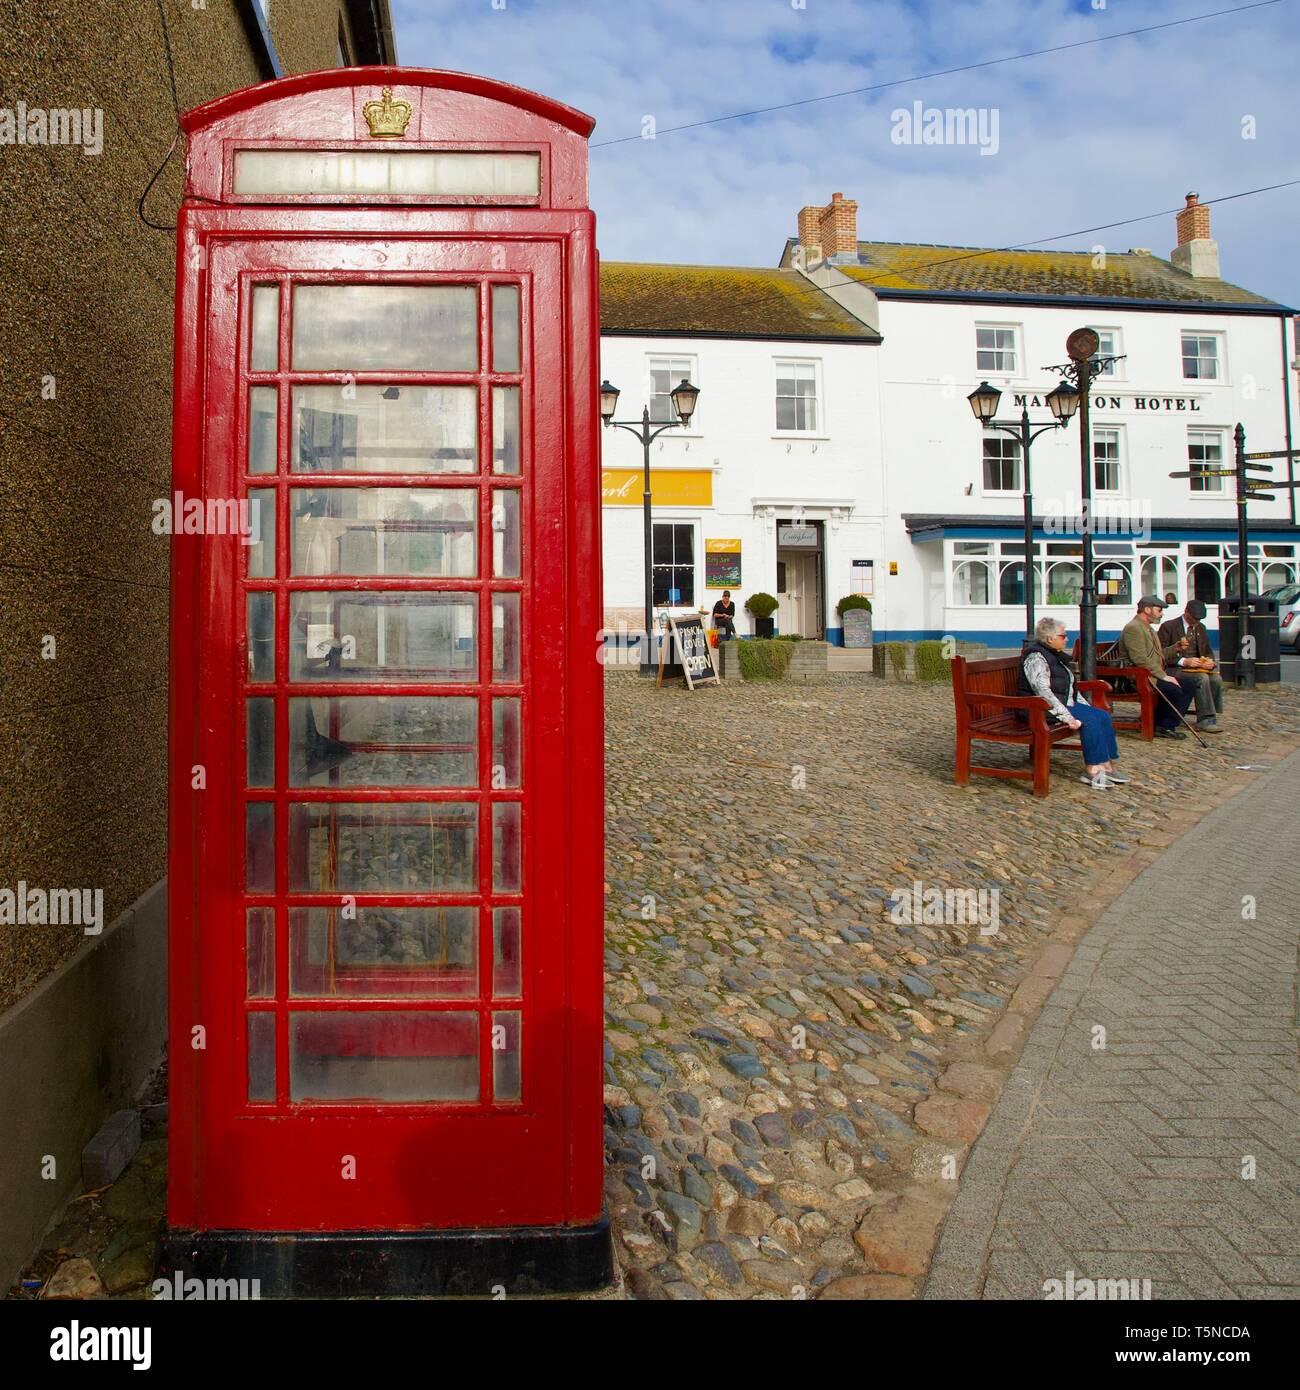 Red telephone box & Marazion Hotel, Marazion, Cornwall, England - Stock Image